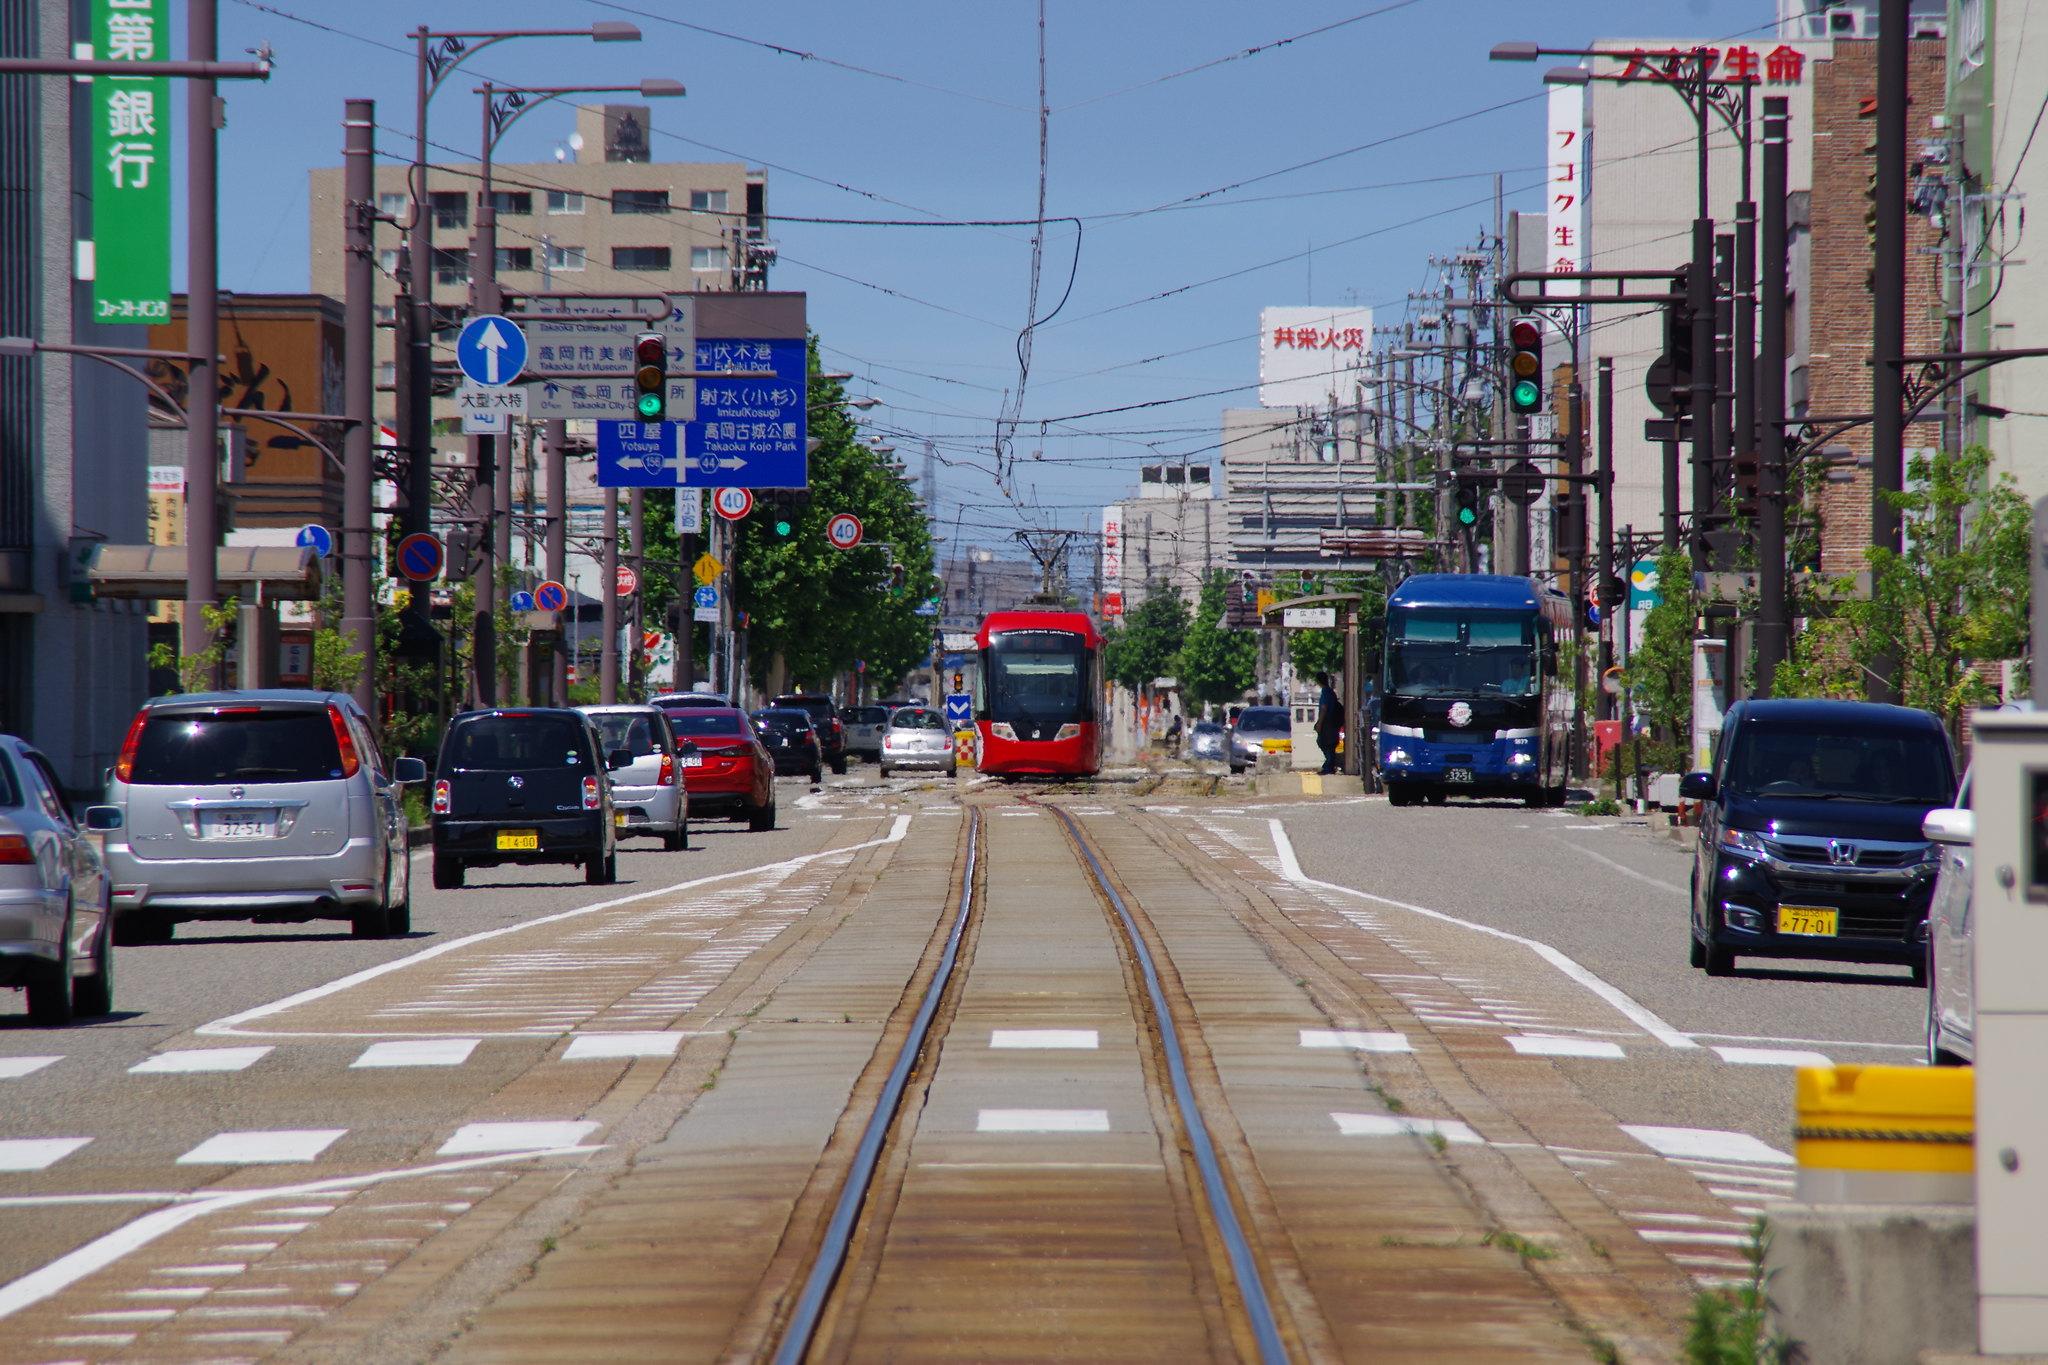 Takaoka City, Japan street in summer heat.